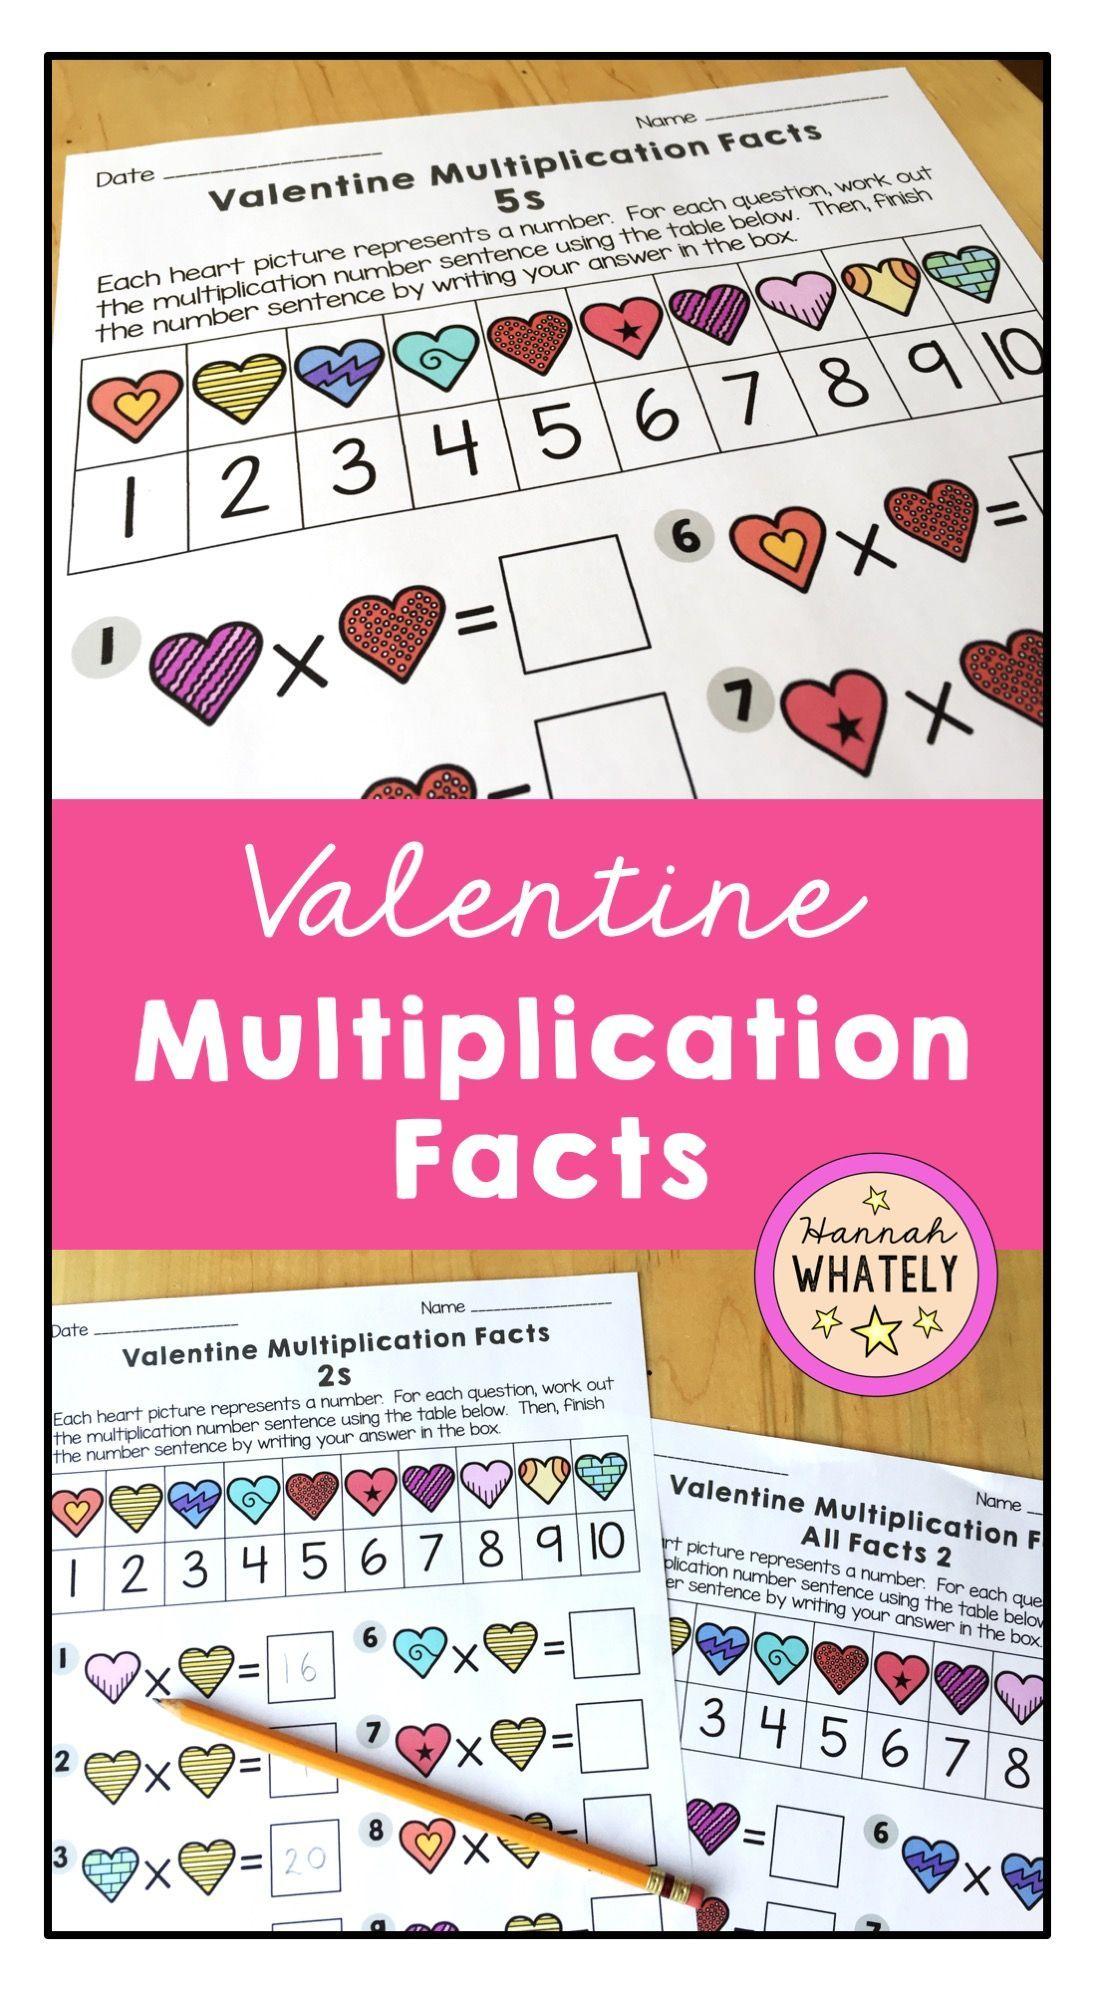 Valentine Multiplication Facts